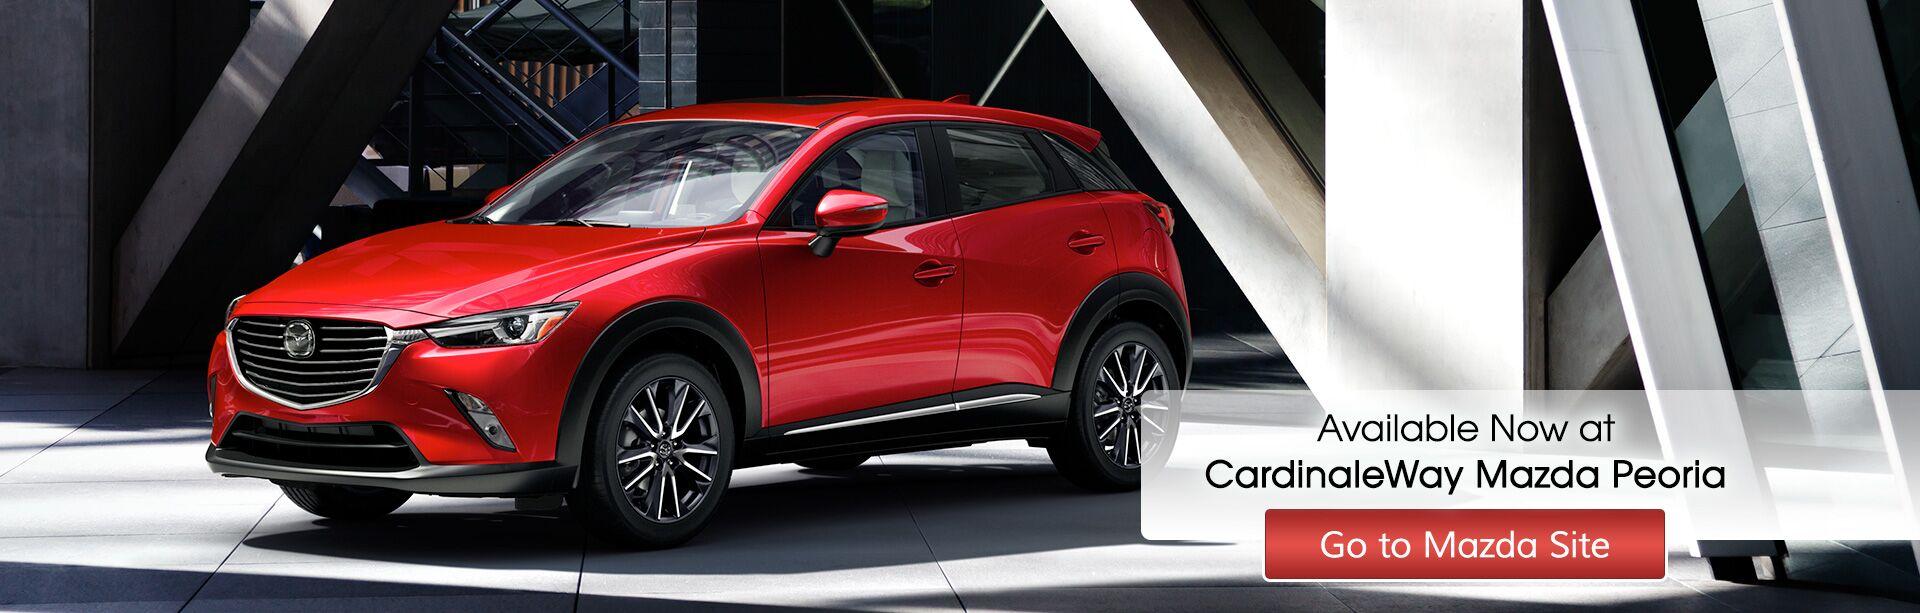 Cardinaleway Mazda Peoria >> Cardinale Automotive Group Seaside CA | GMC Hyundai Mazda Nissan Toyota Volkswagen Dealers | GMC ...